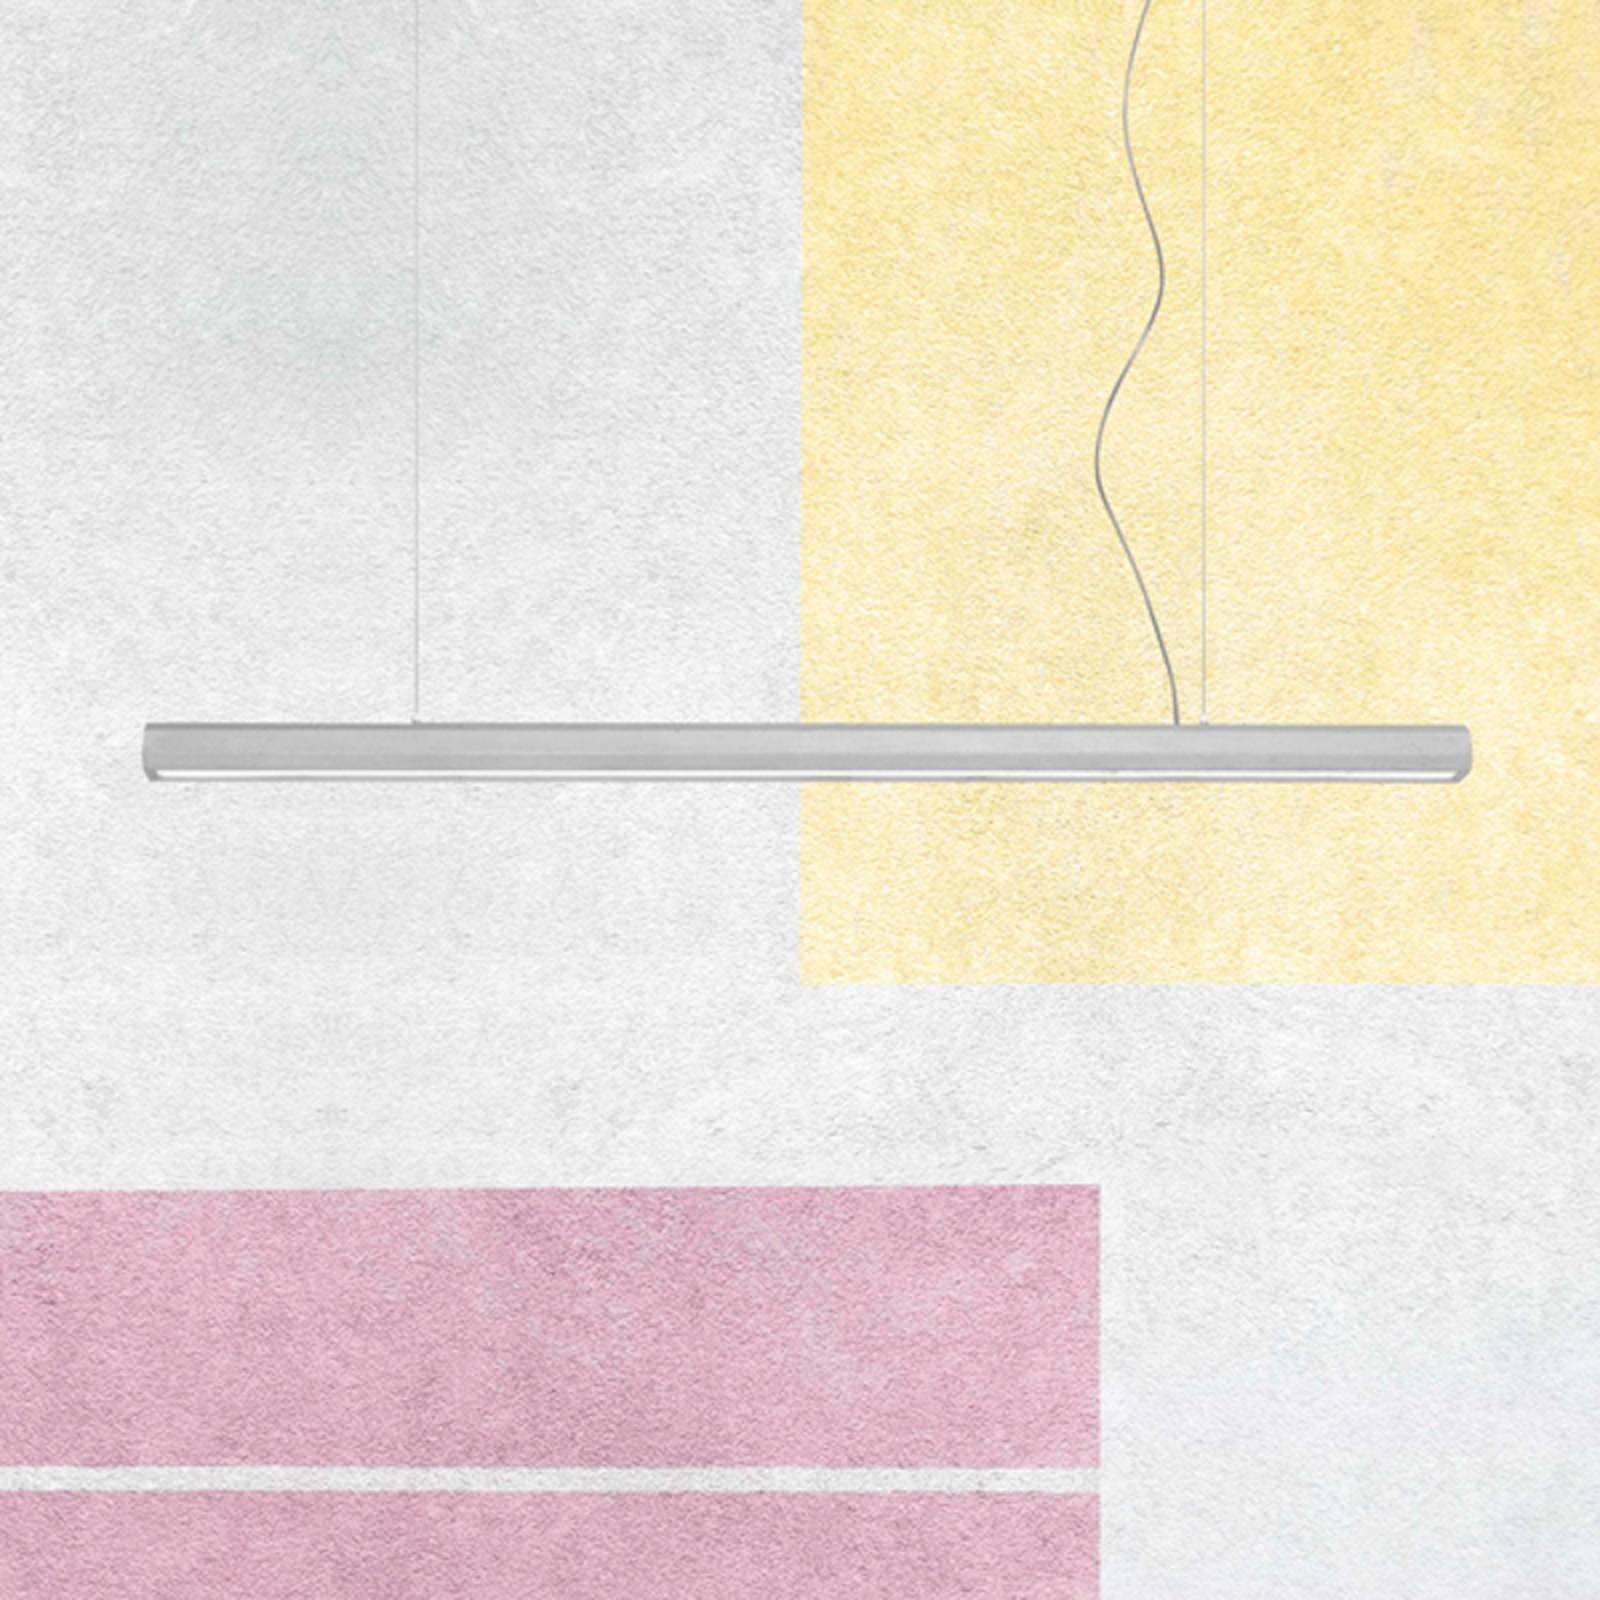 LED-riippuvalo Materica Stick L, sementti, 100 cm